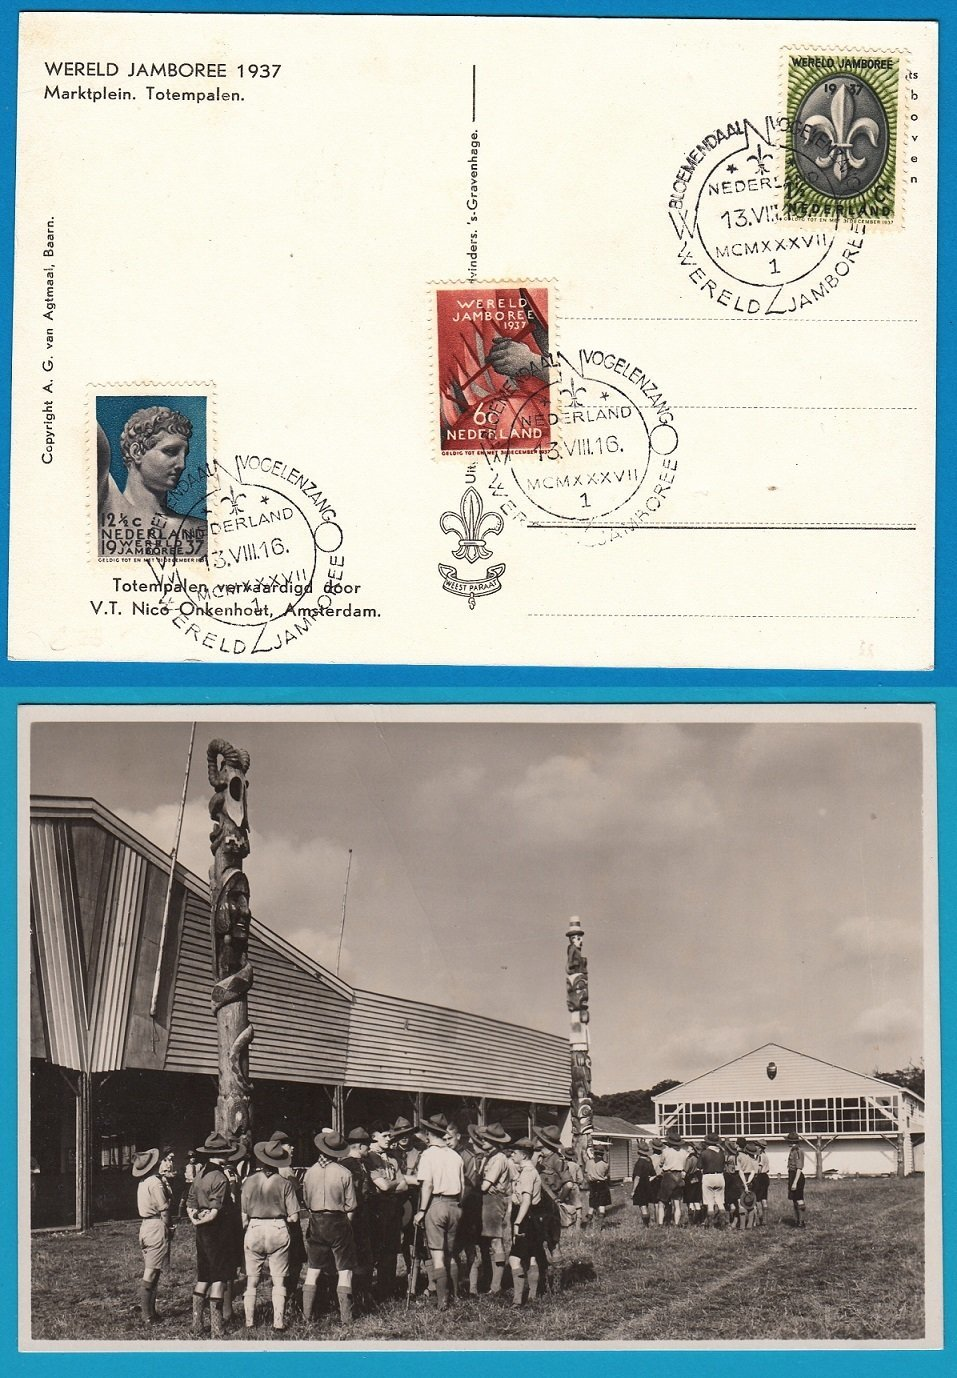 NEDERLAND prentbriefkaart 1937 Wereld Jamboree Vogelenzang Totempalen